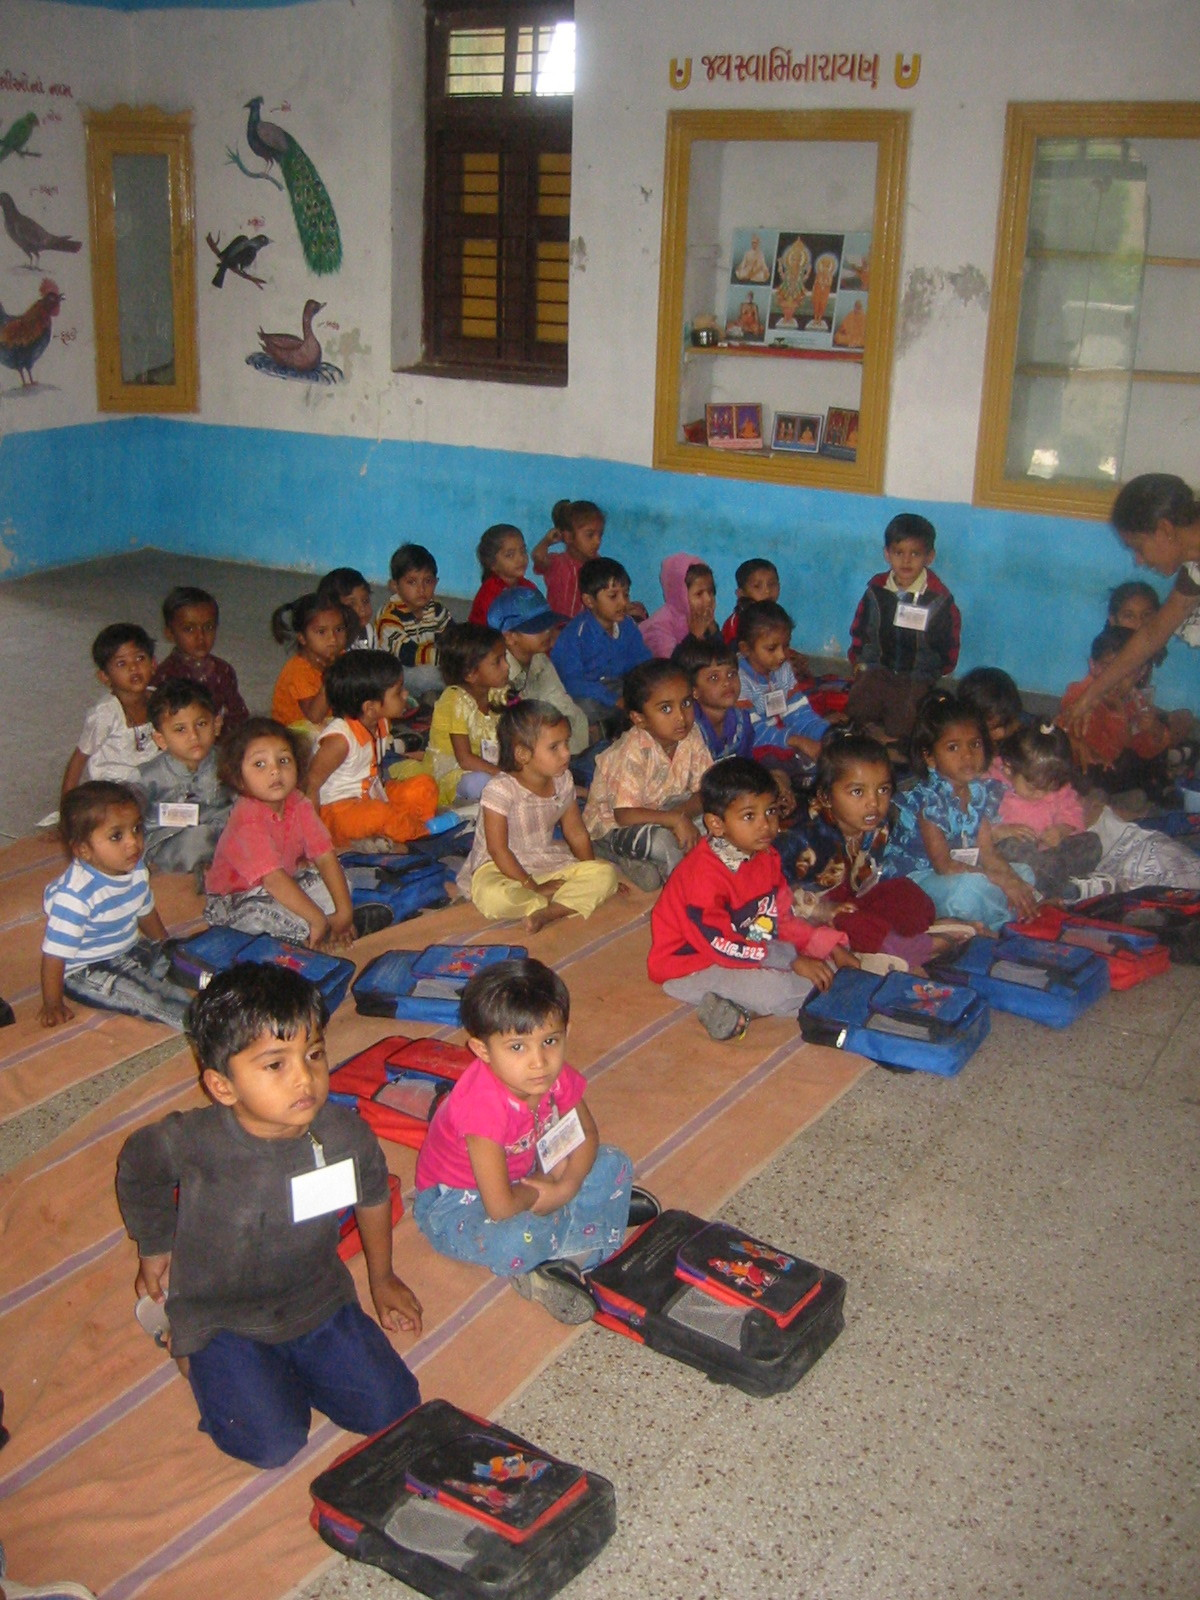 sunset cooperative preschool nursery school images pictures thenurseries 607